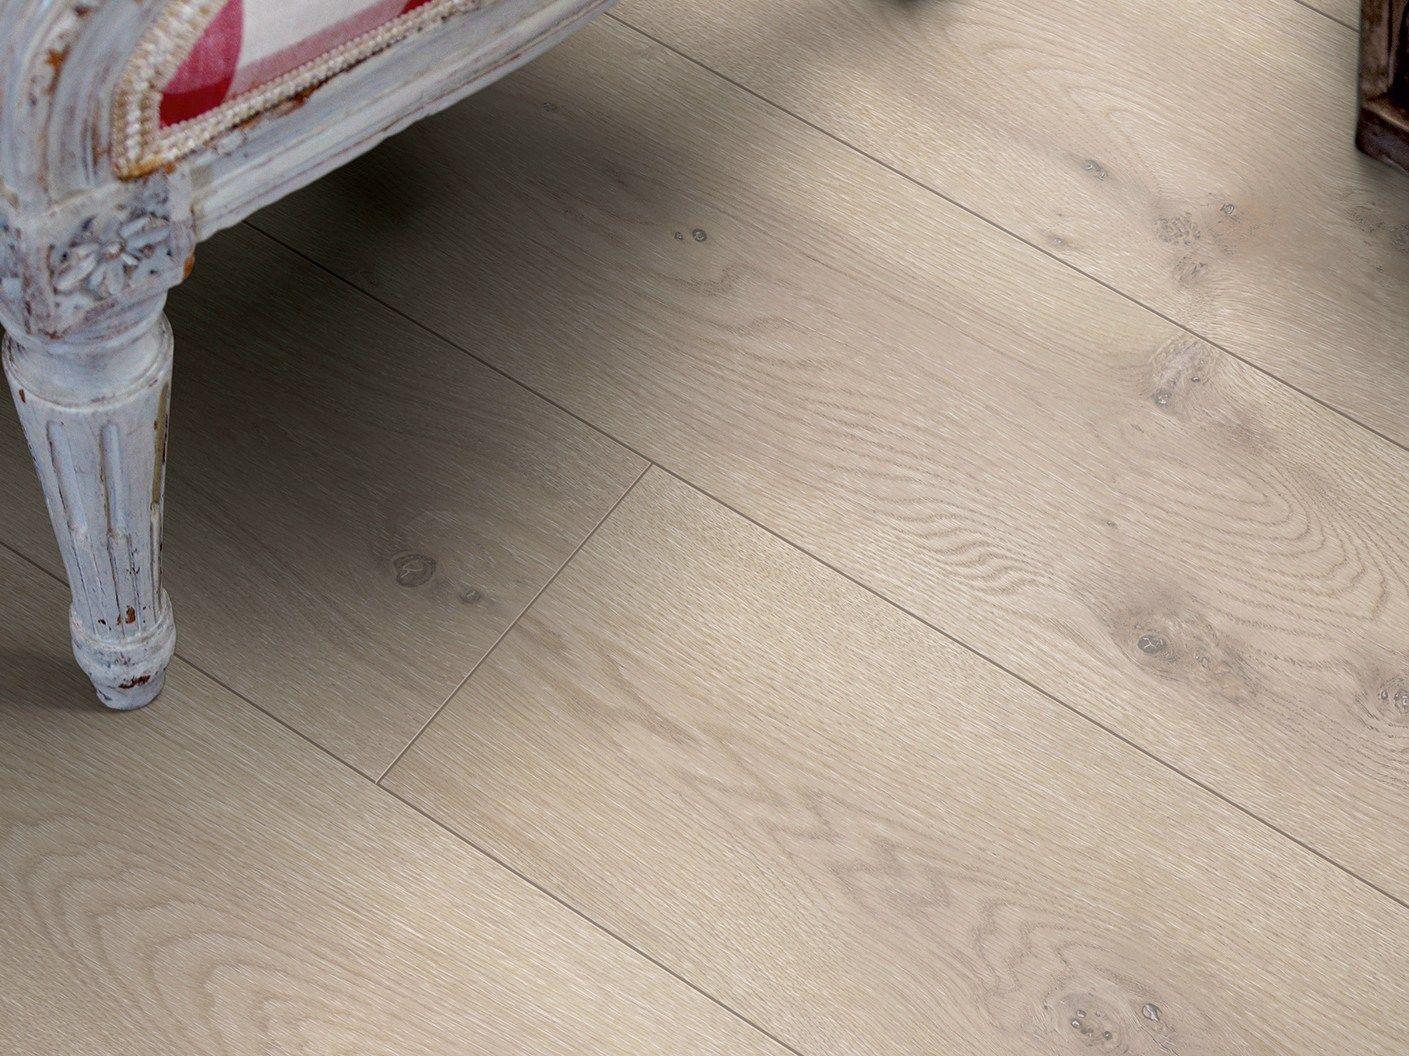 Pavimento en laminado imitaci n madera roble gris moderno - Pavimento imitacion madera ...